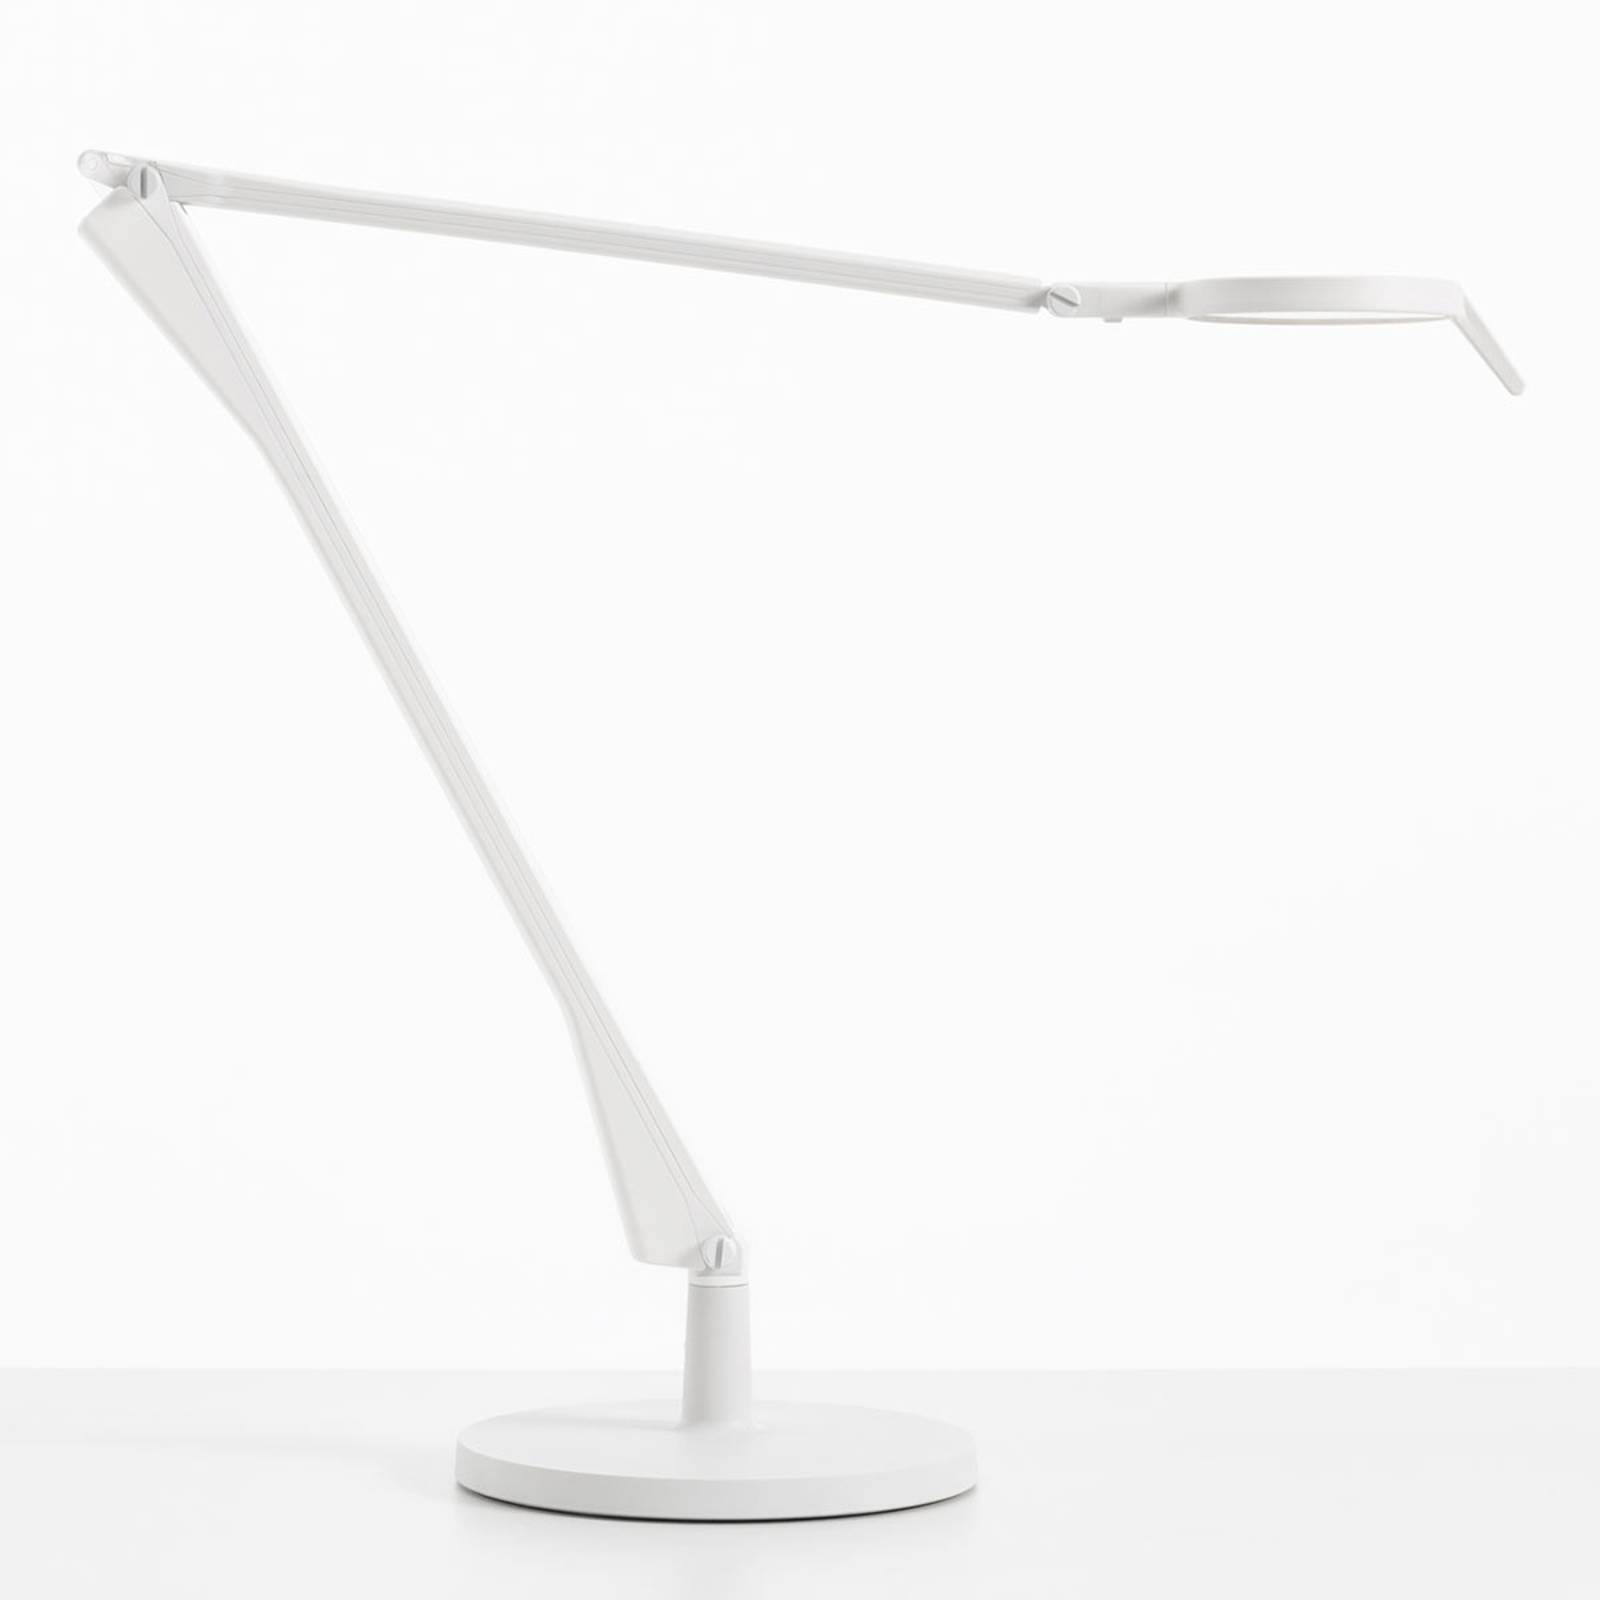 Kartell Aledin Tec lampe à poser LED, blanche